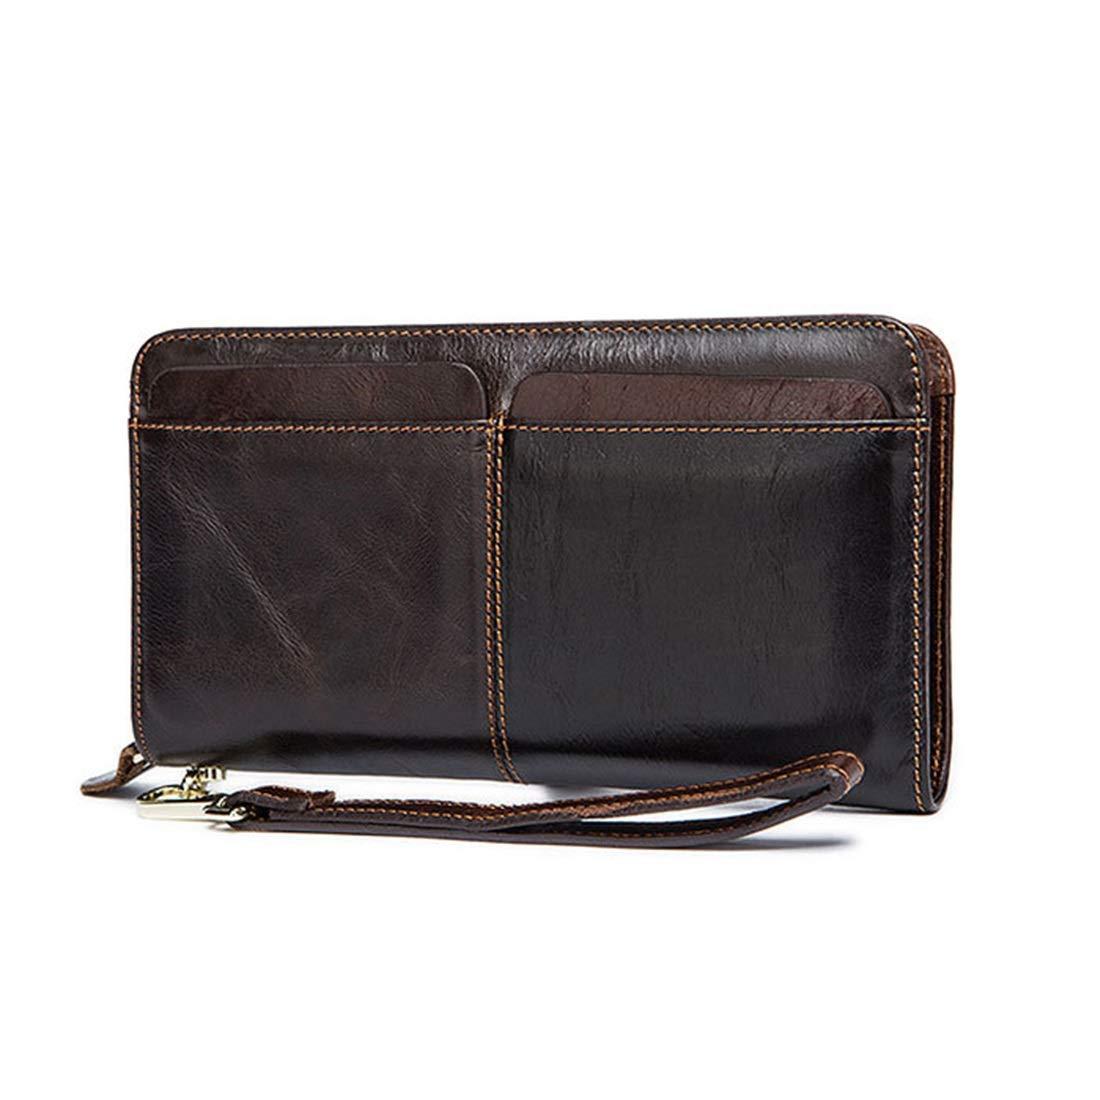 KRPENRIO Zipper Long Wallet Mens Men Business Card Holder Coin Purse Mens Wallet Popular Leather Made